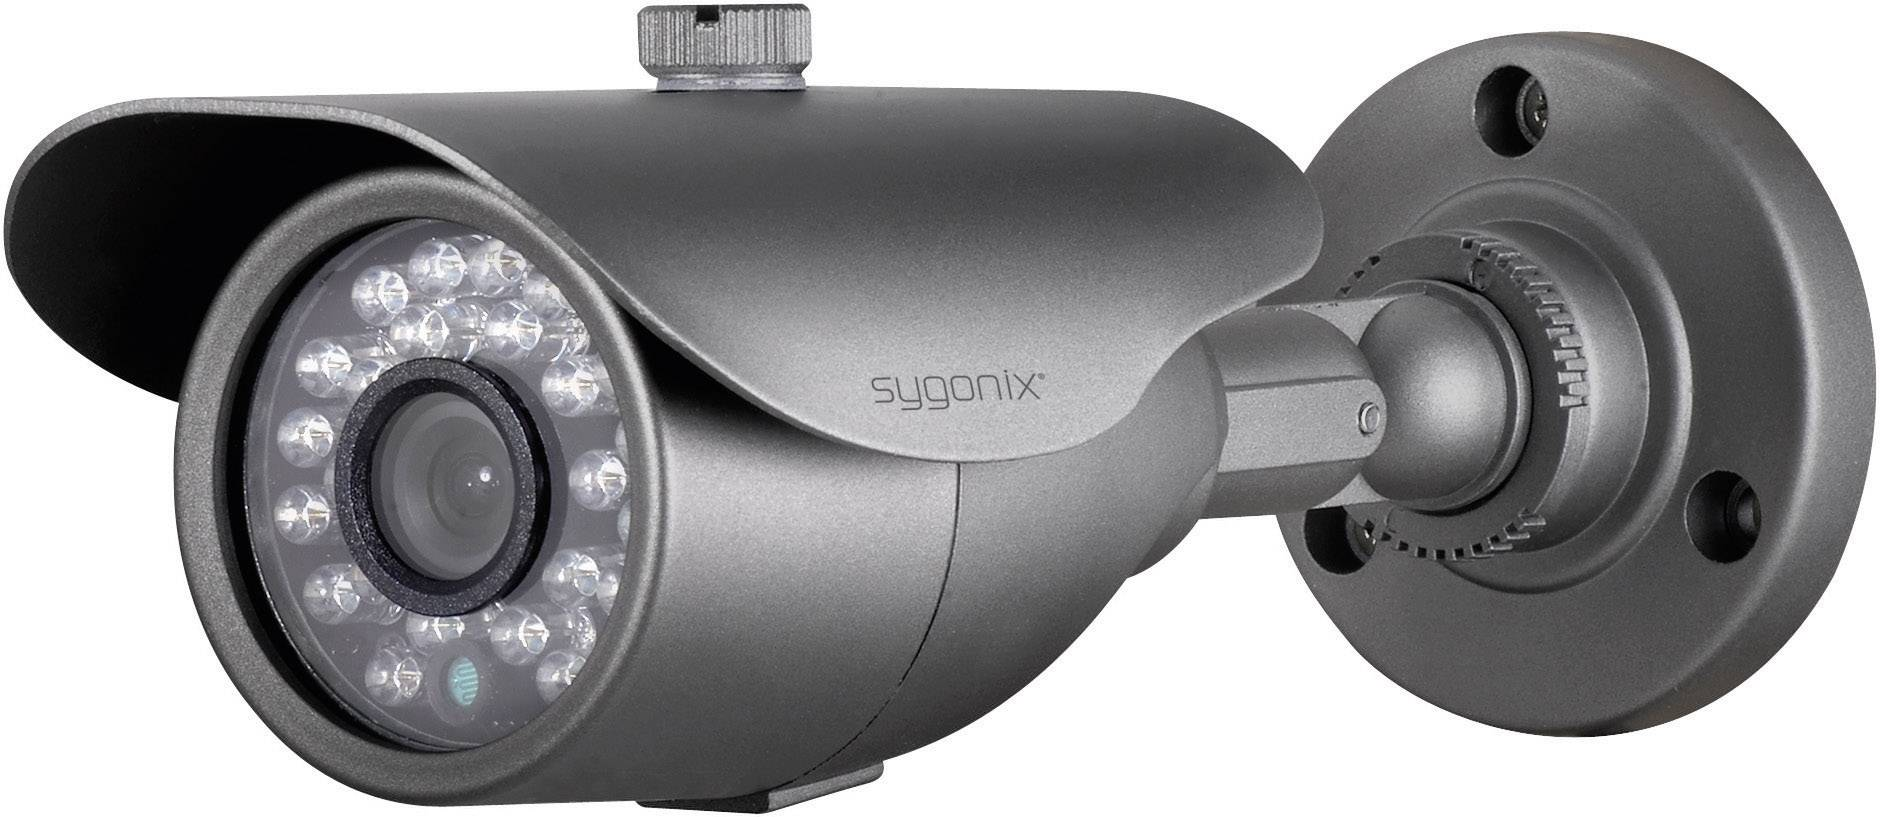 Káblové sledovacie kamery